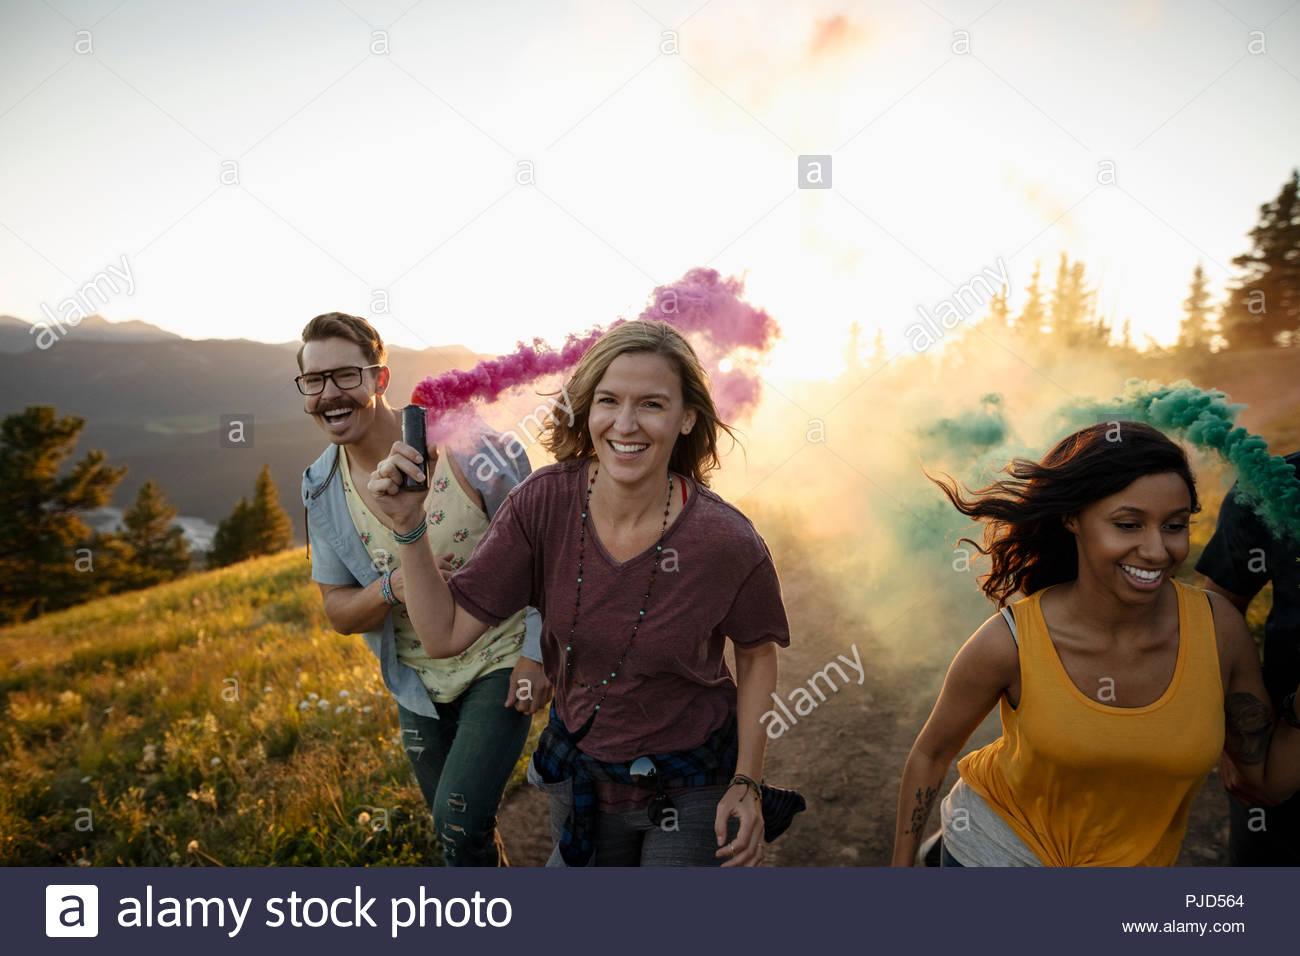 Playful friends enjoying colorful smoke bombs on sunny mountain road - Stock Image